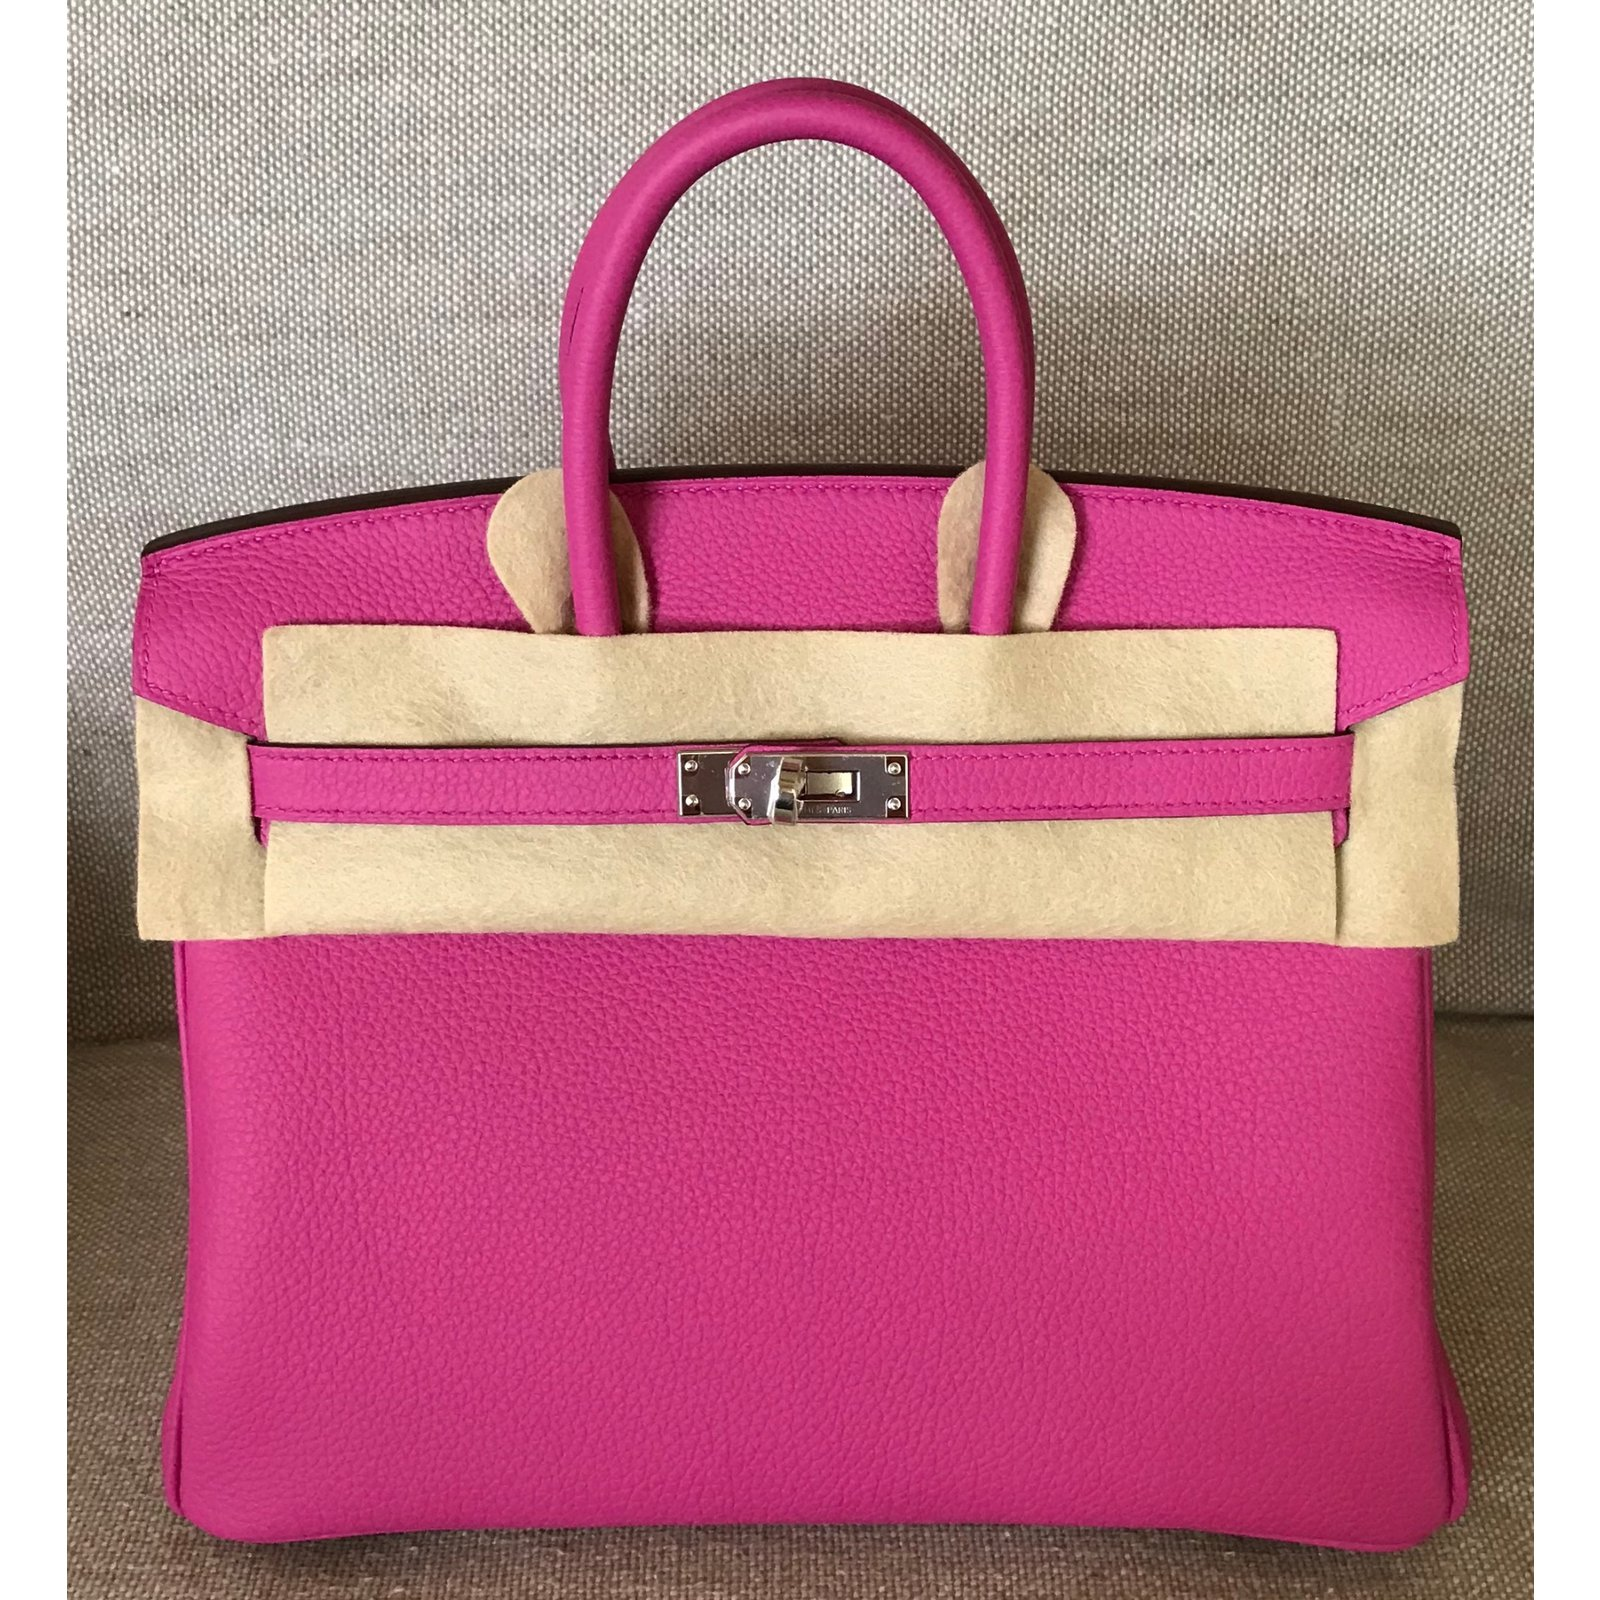 a9230d2ef36c Hermès Hermes Birkin 25CM Magnolia Togo Leather with Palladium Hardware  Totes Leather Pink ref.69114 - Joli Closet